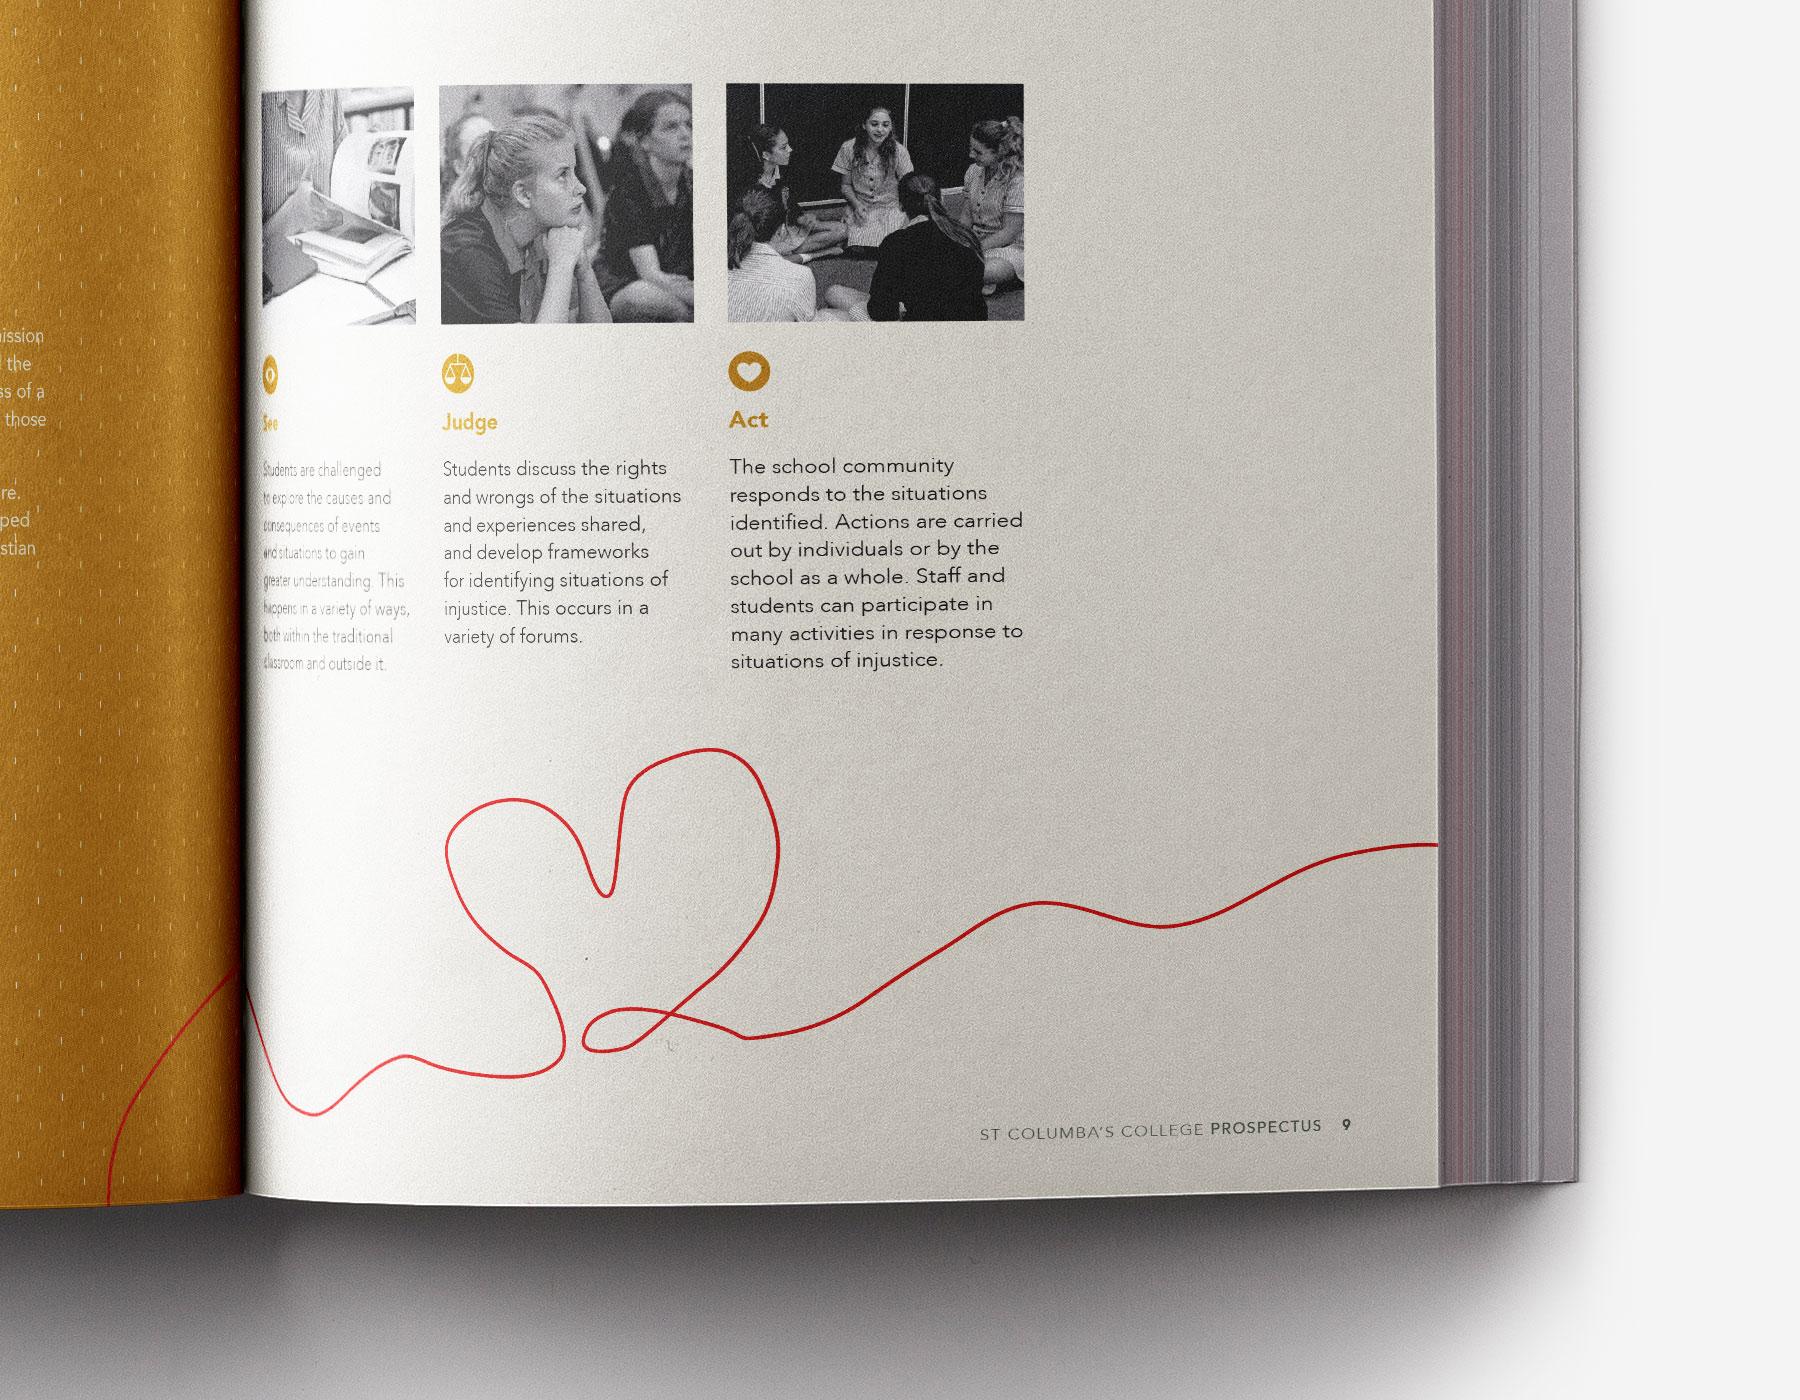 StColumbasCollege-PrintDesign-Melbourne-05